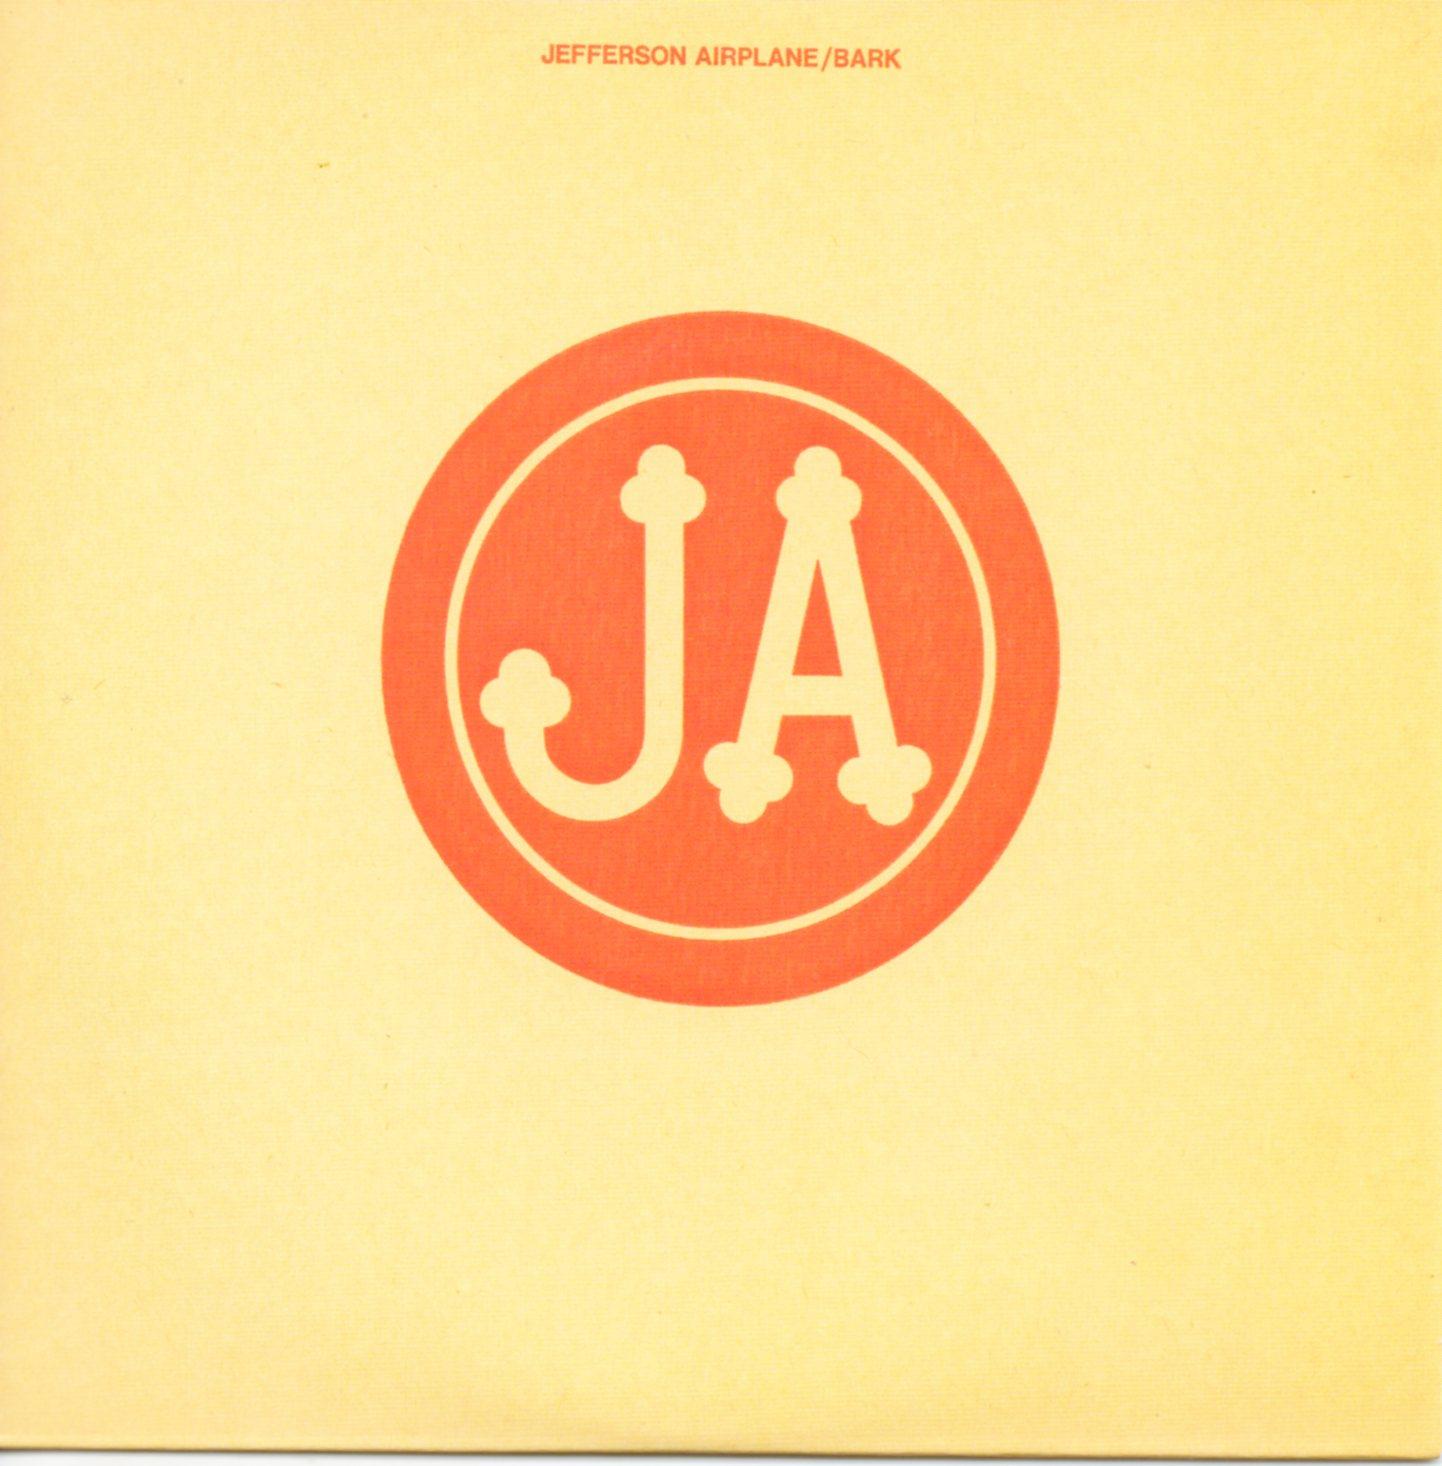 JEFFERSON AIRPLANE - Bark - Mini LP - CARD SLEEVE 11-track - CD